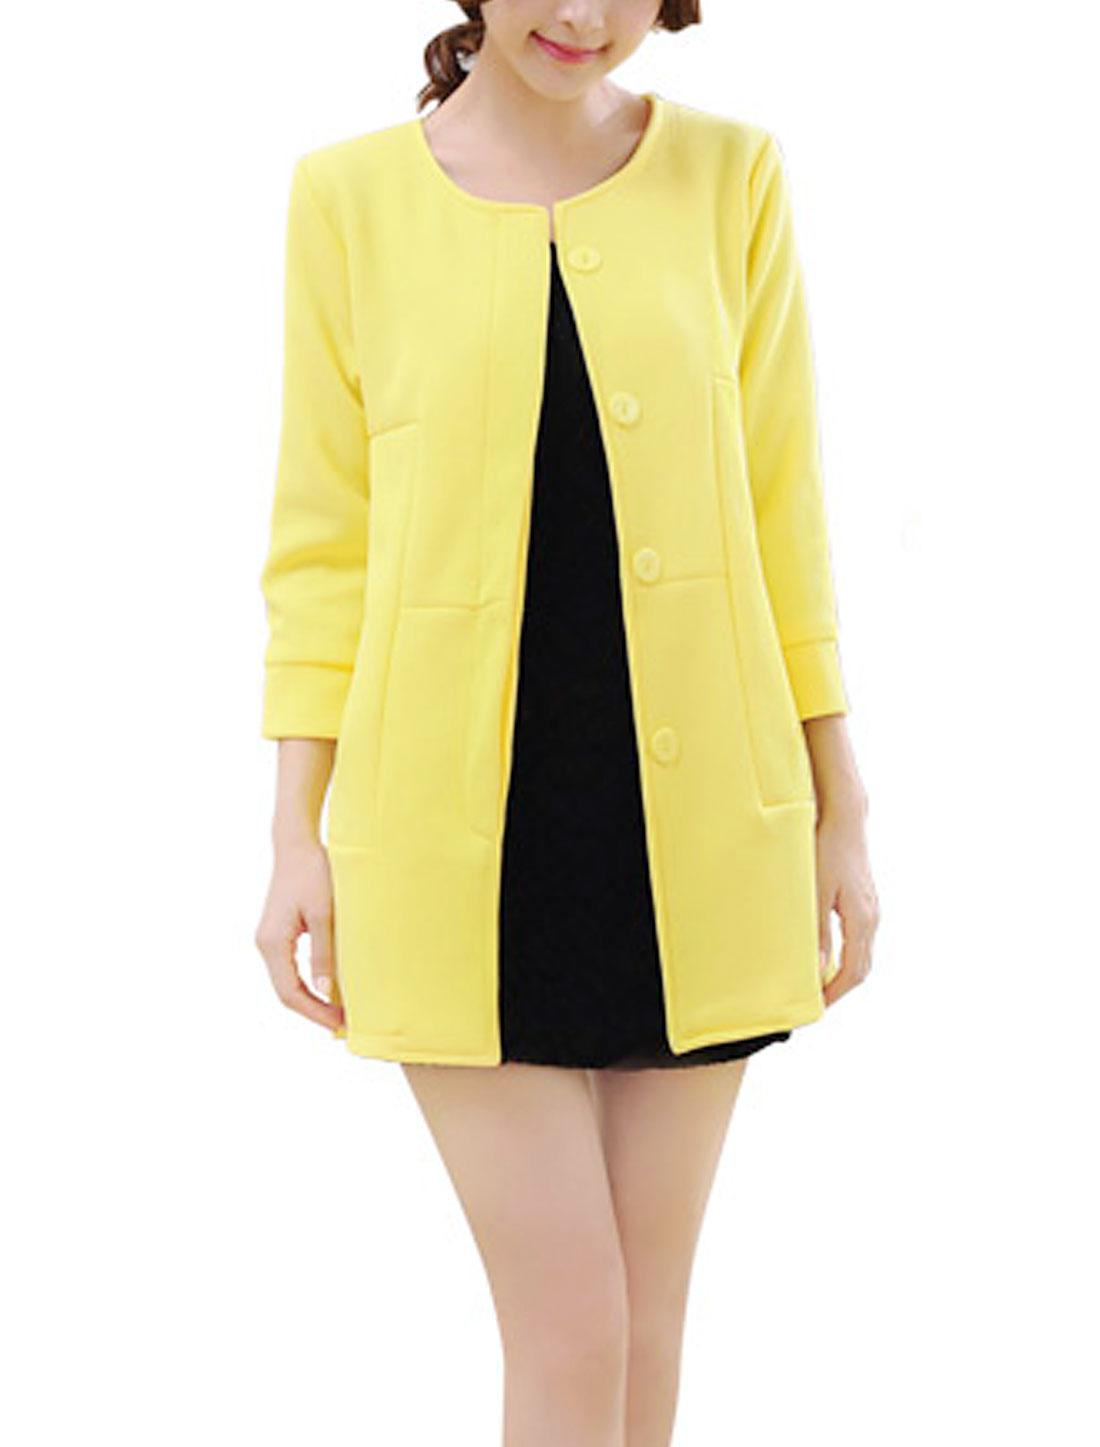 Lady Round Neck Double Slant Pockets Casual Blazer Light Yellow S